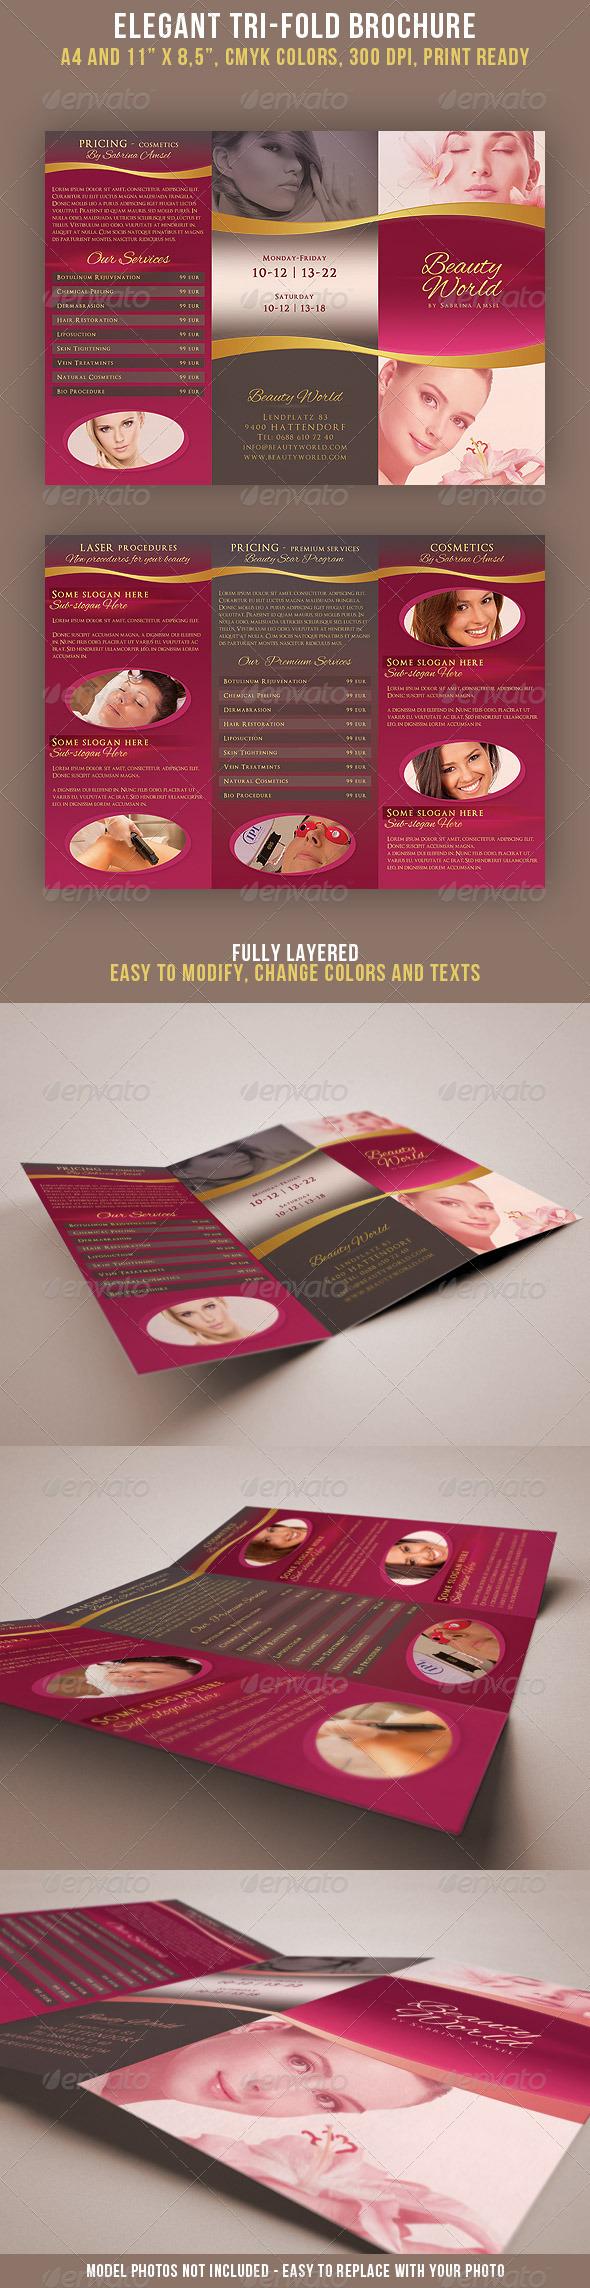 Elegant Tri-fold Brochure - Brochures Print Templates